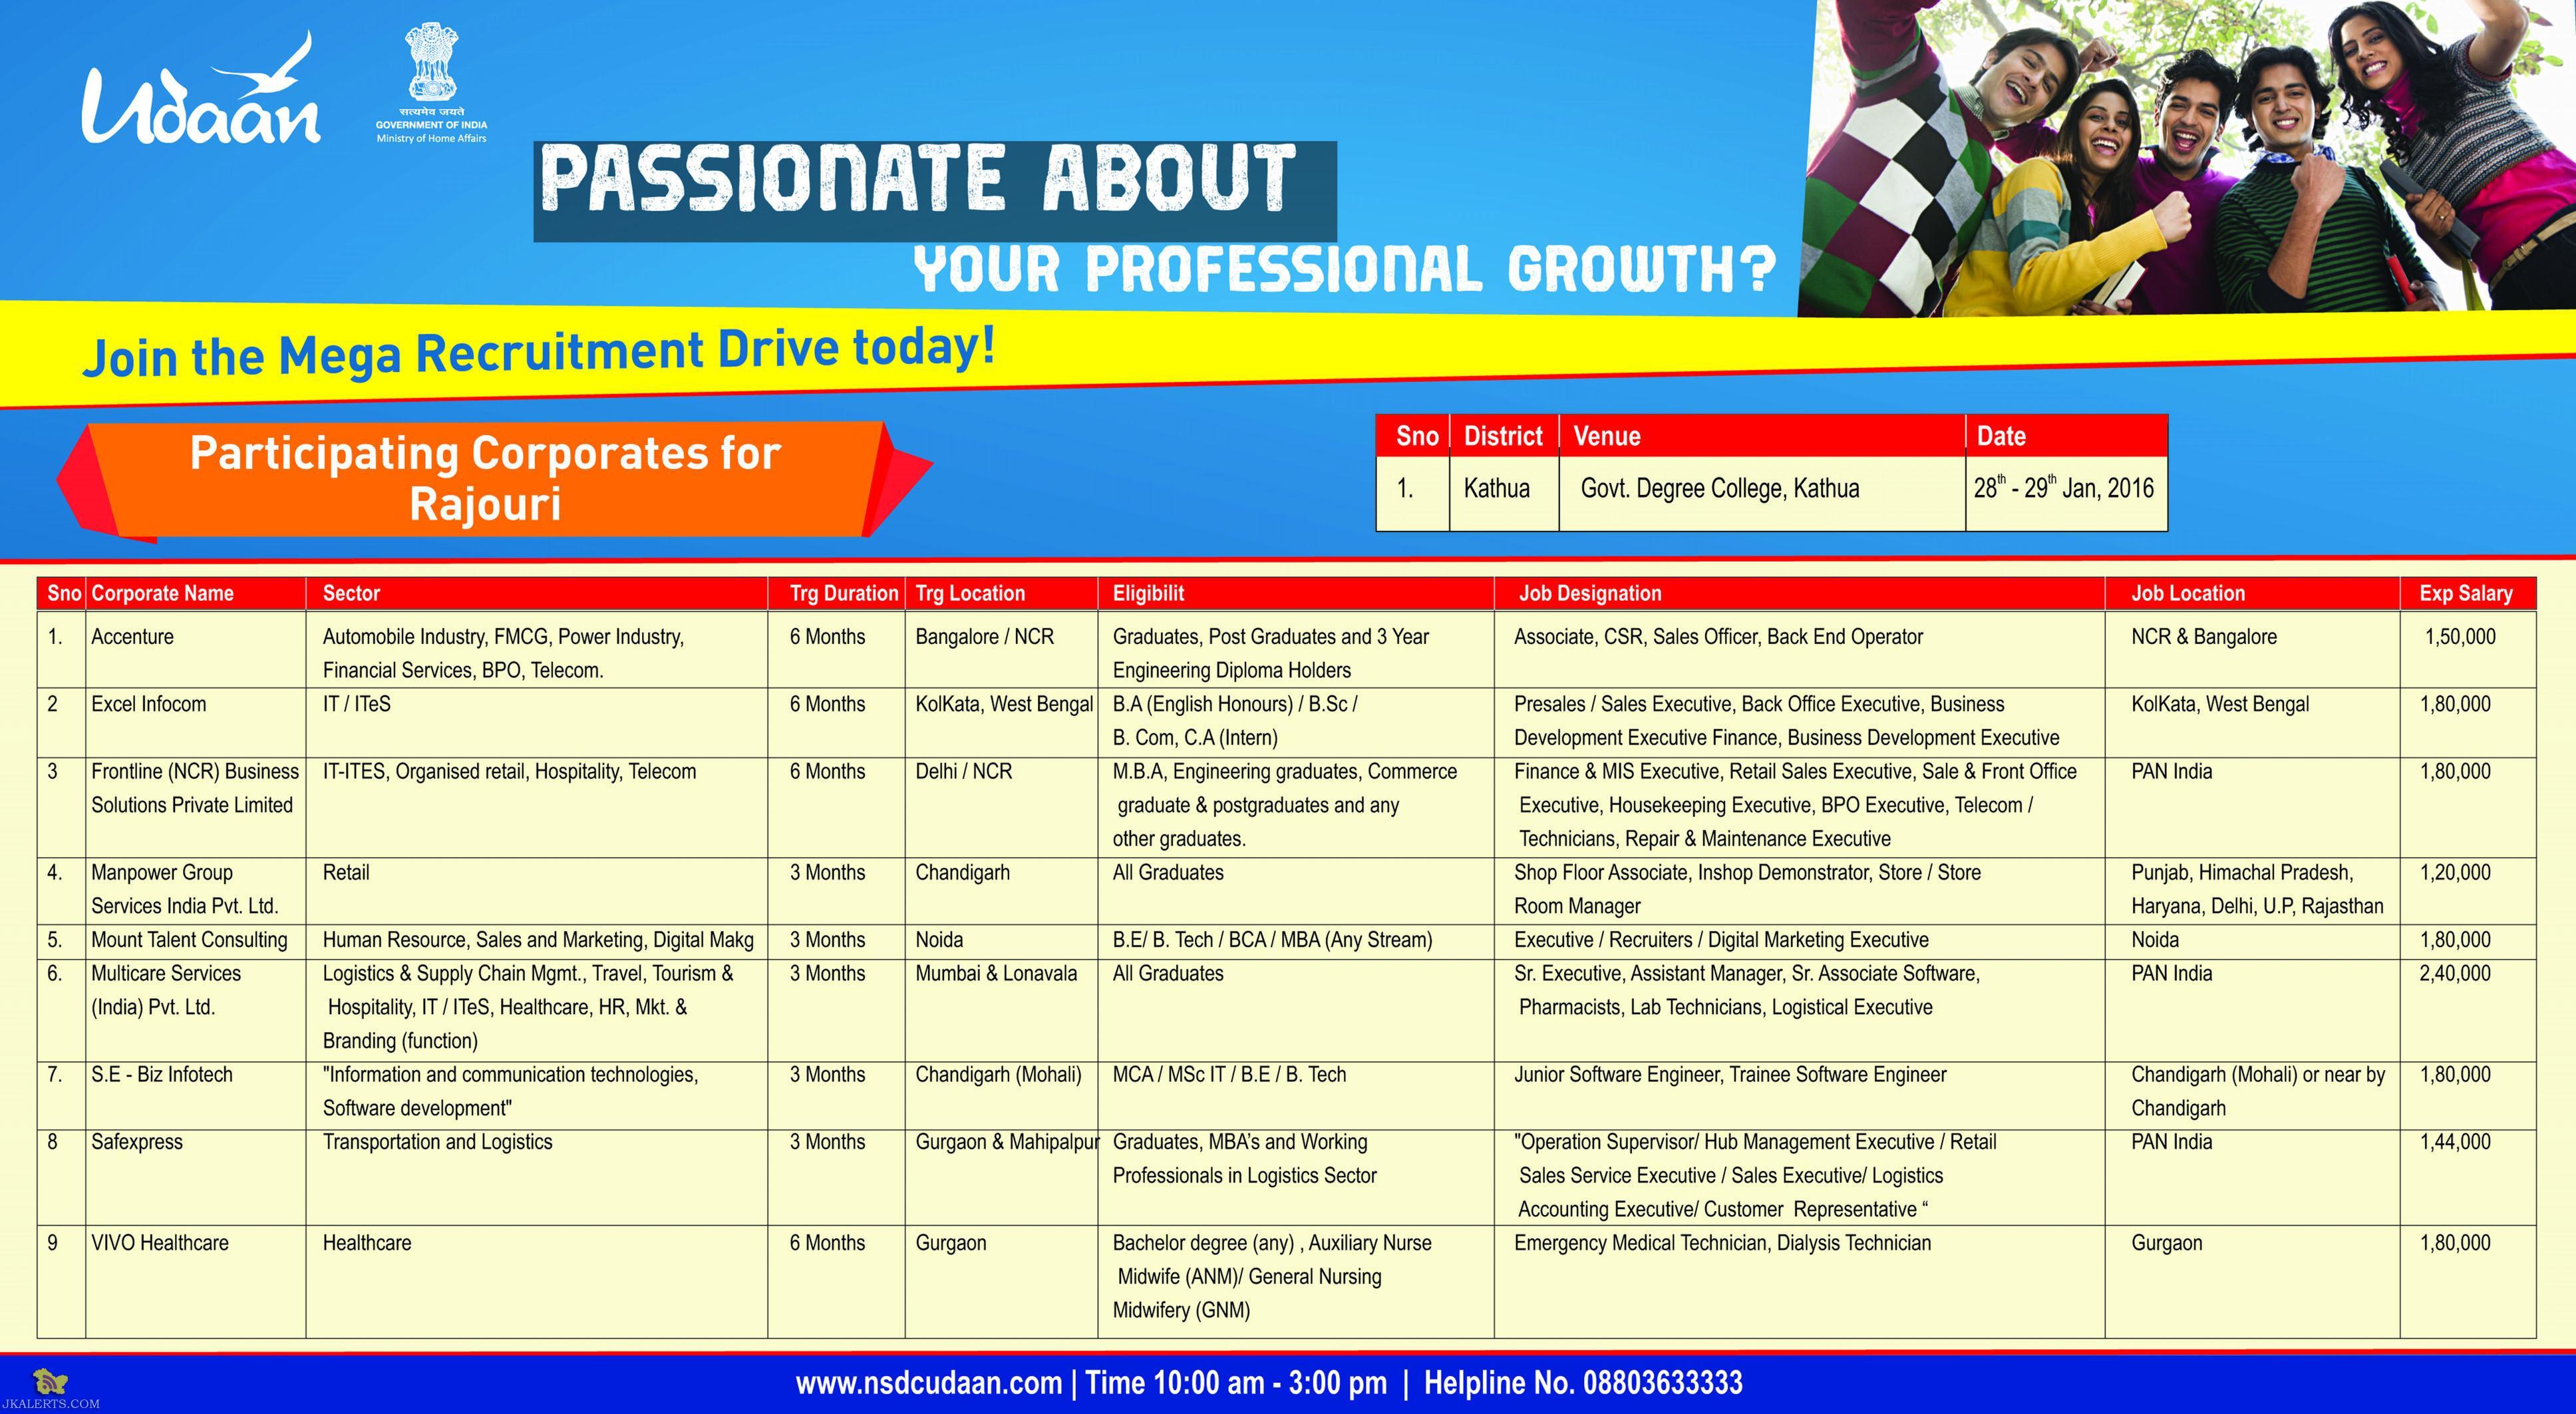 Udaan recruitment drive 2016 Kathua, GDC Kathua